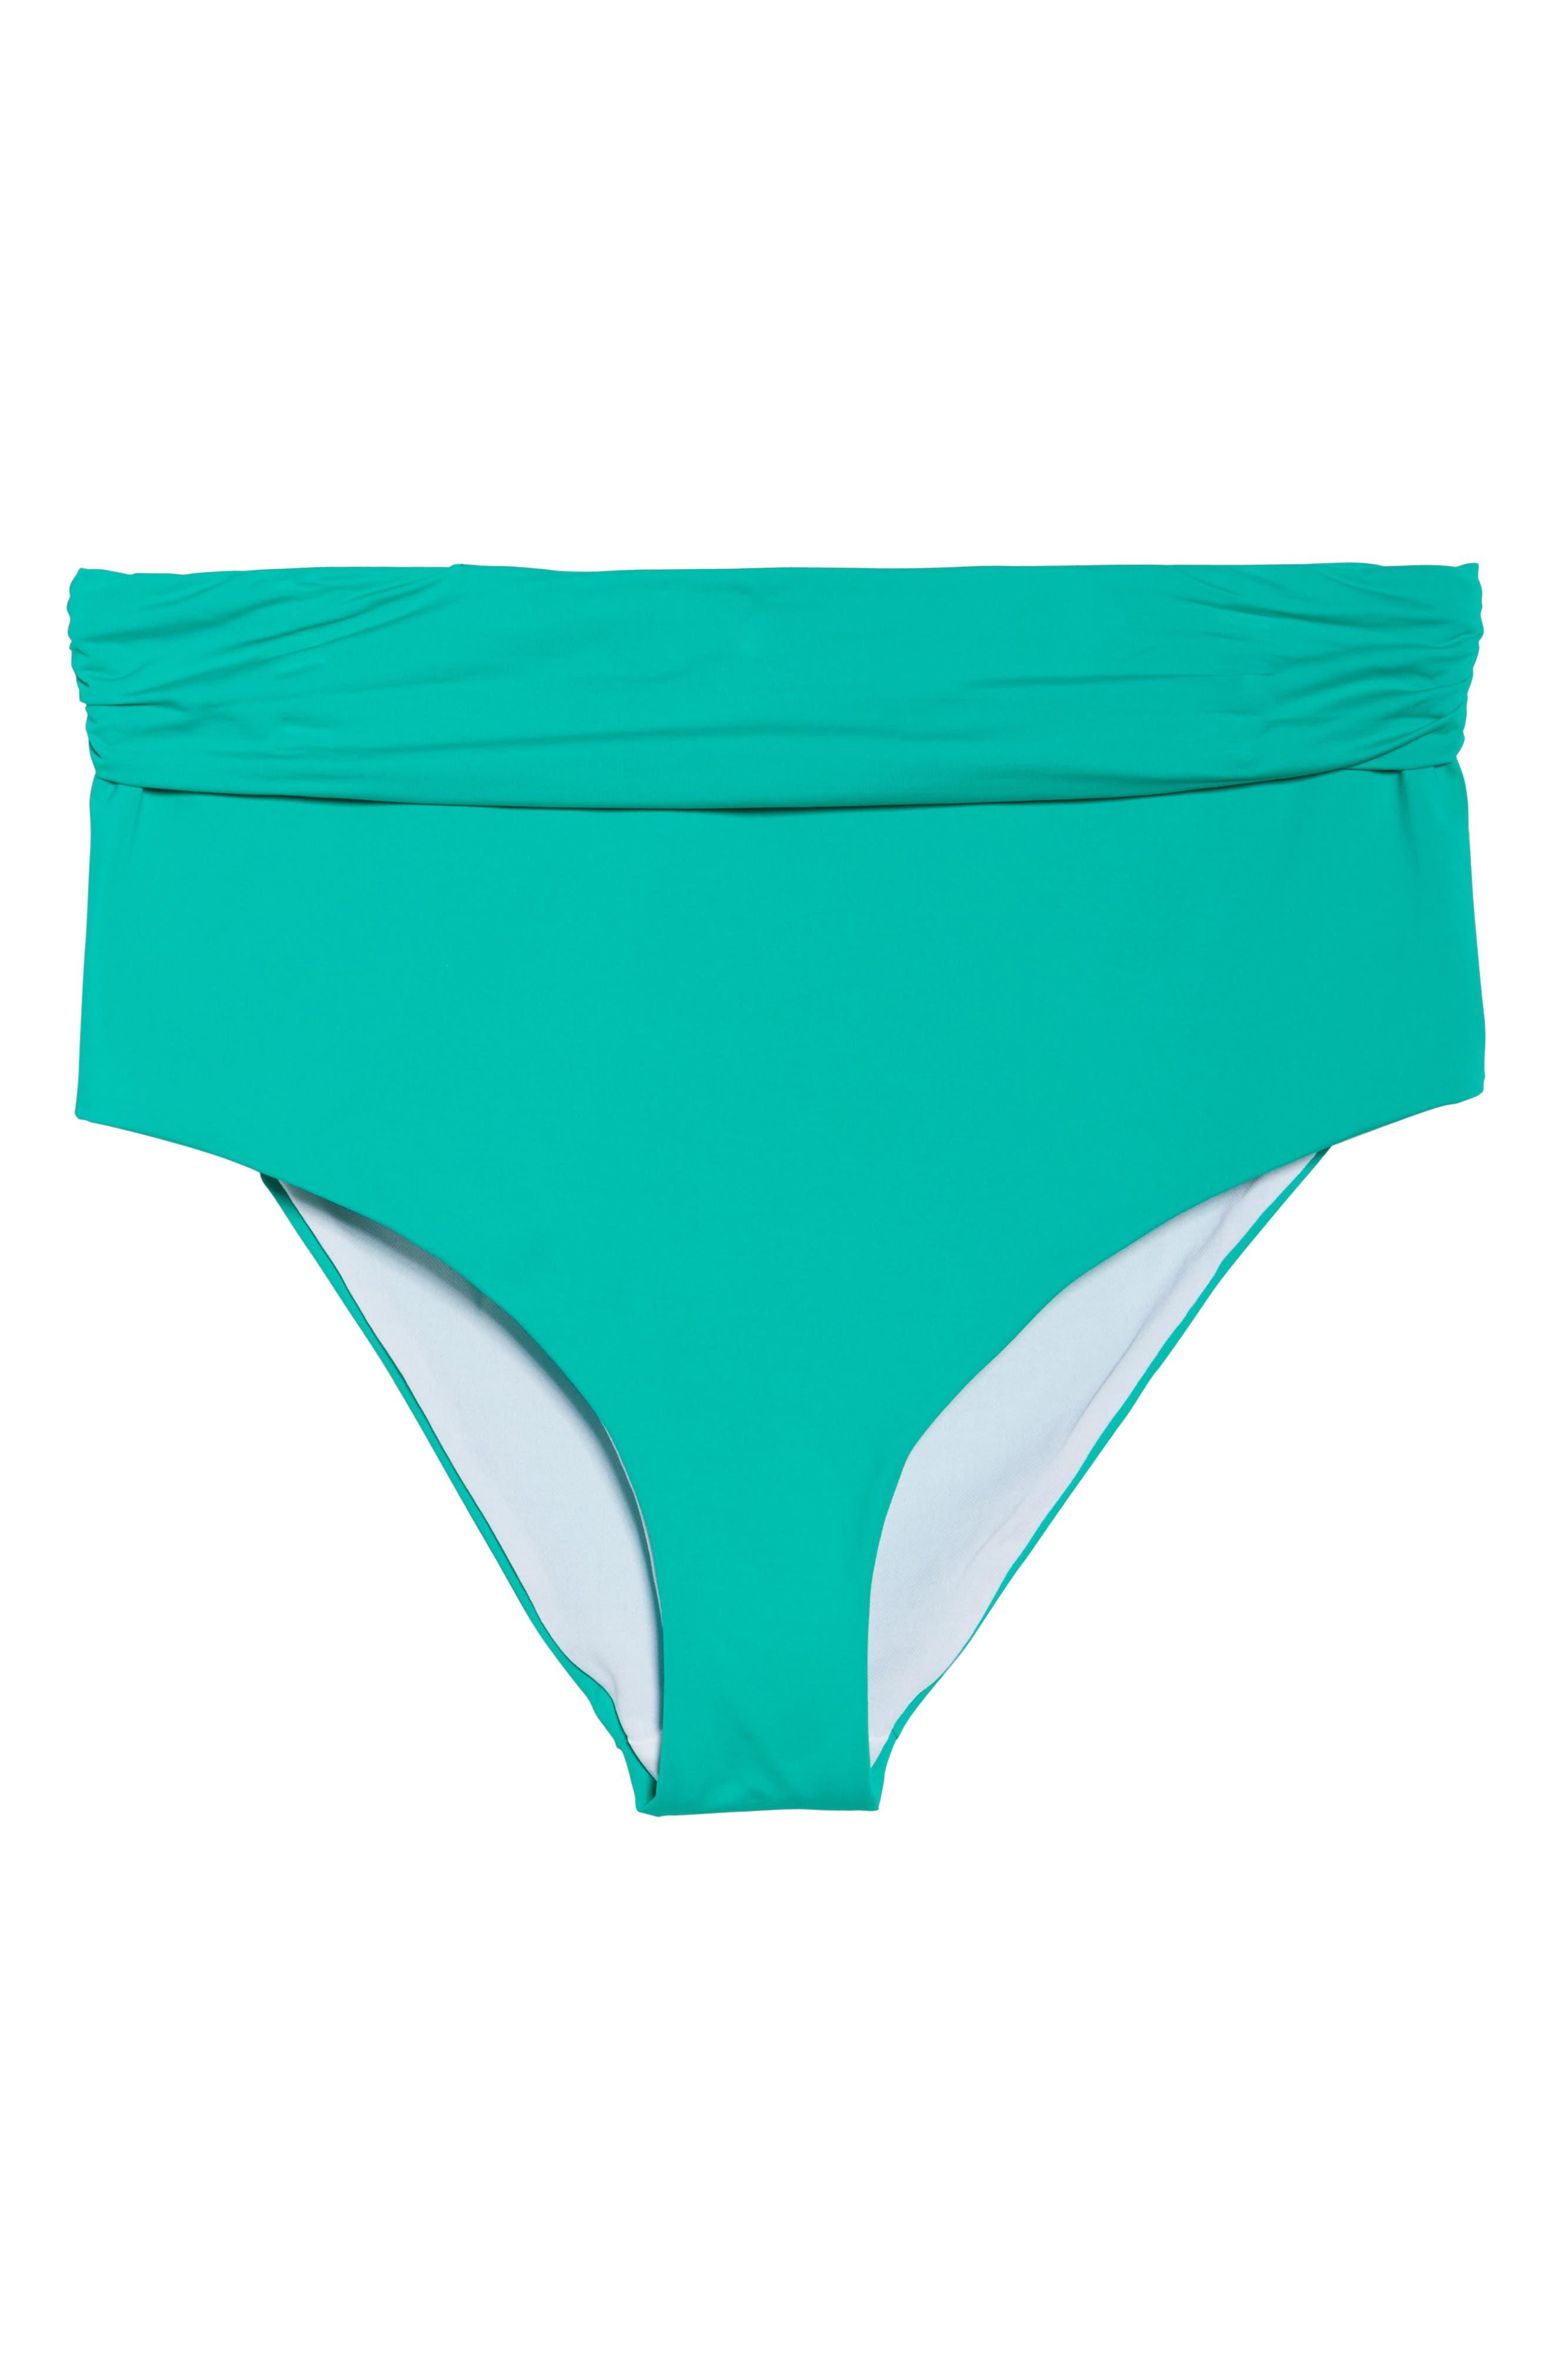 Color Splash High Waist Bikini Bottoms,                             Alternate thumbnail 6, color,                             305